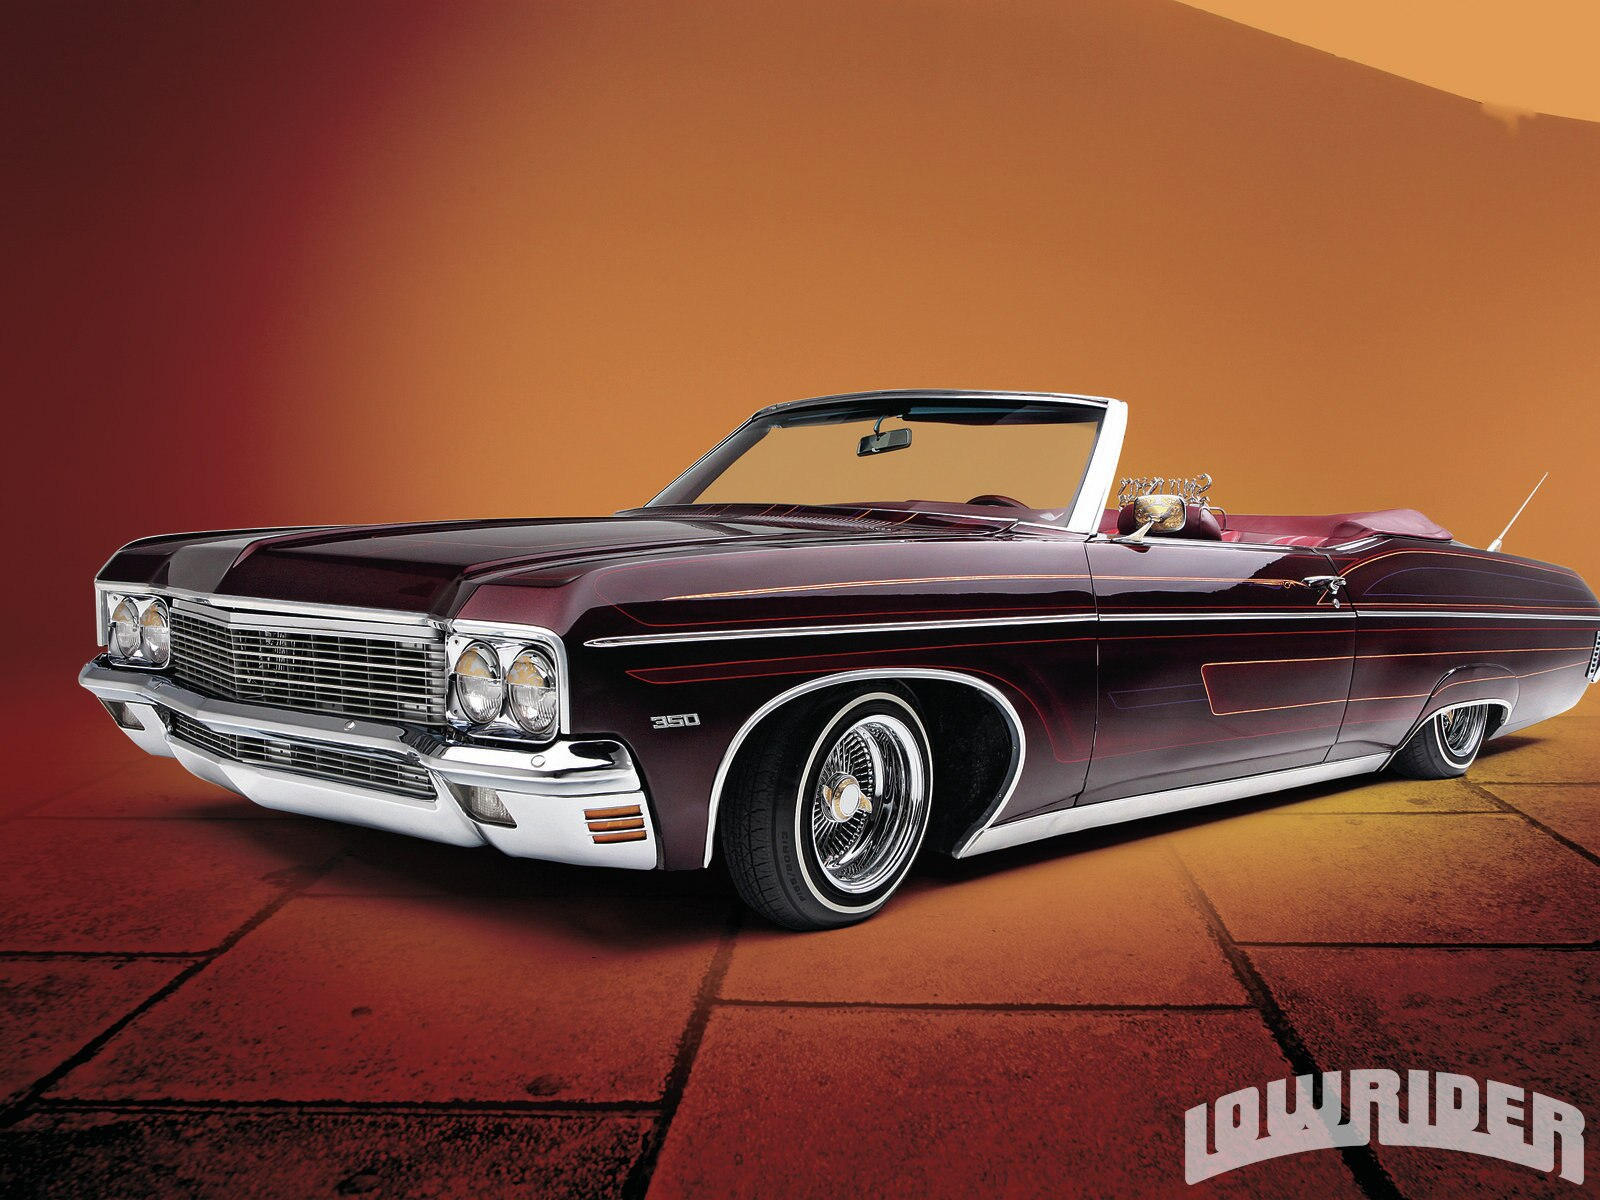 Lowrider Miami >> 1970 Chevrolet Impala Convertible - Lowrider Magazine